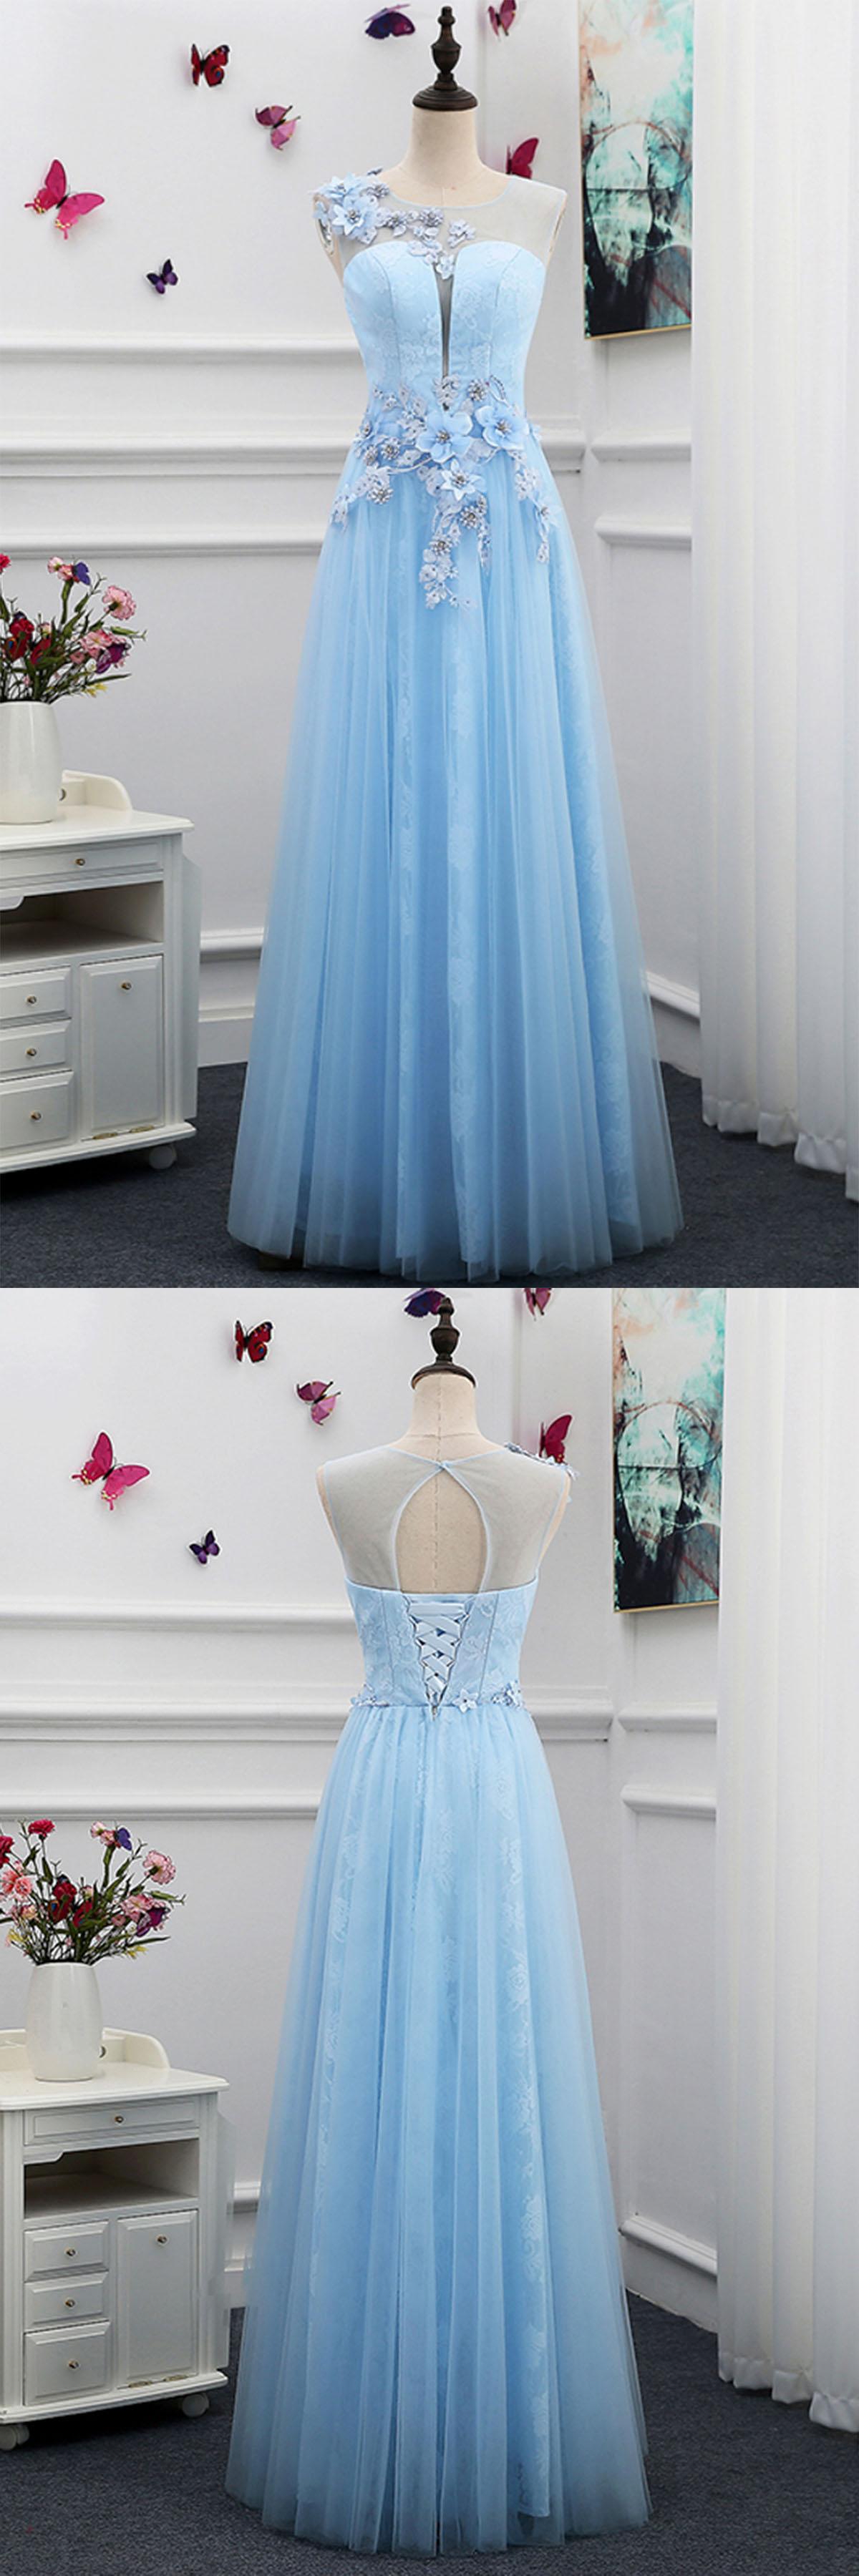 Unique light blue tulle floor length 3D flower halter formal prom ...